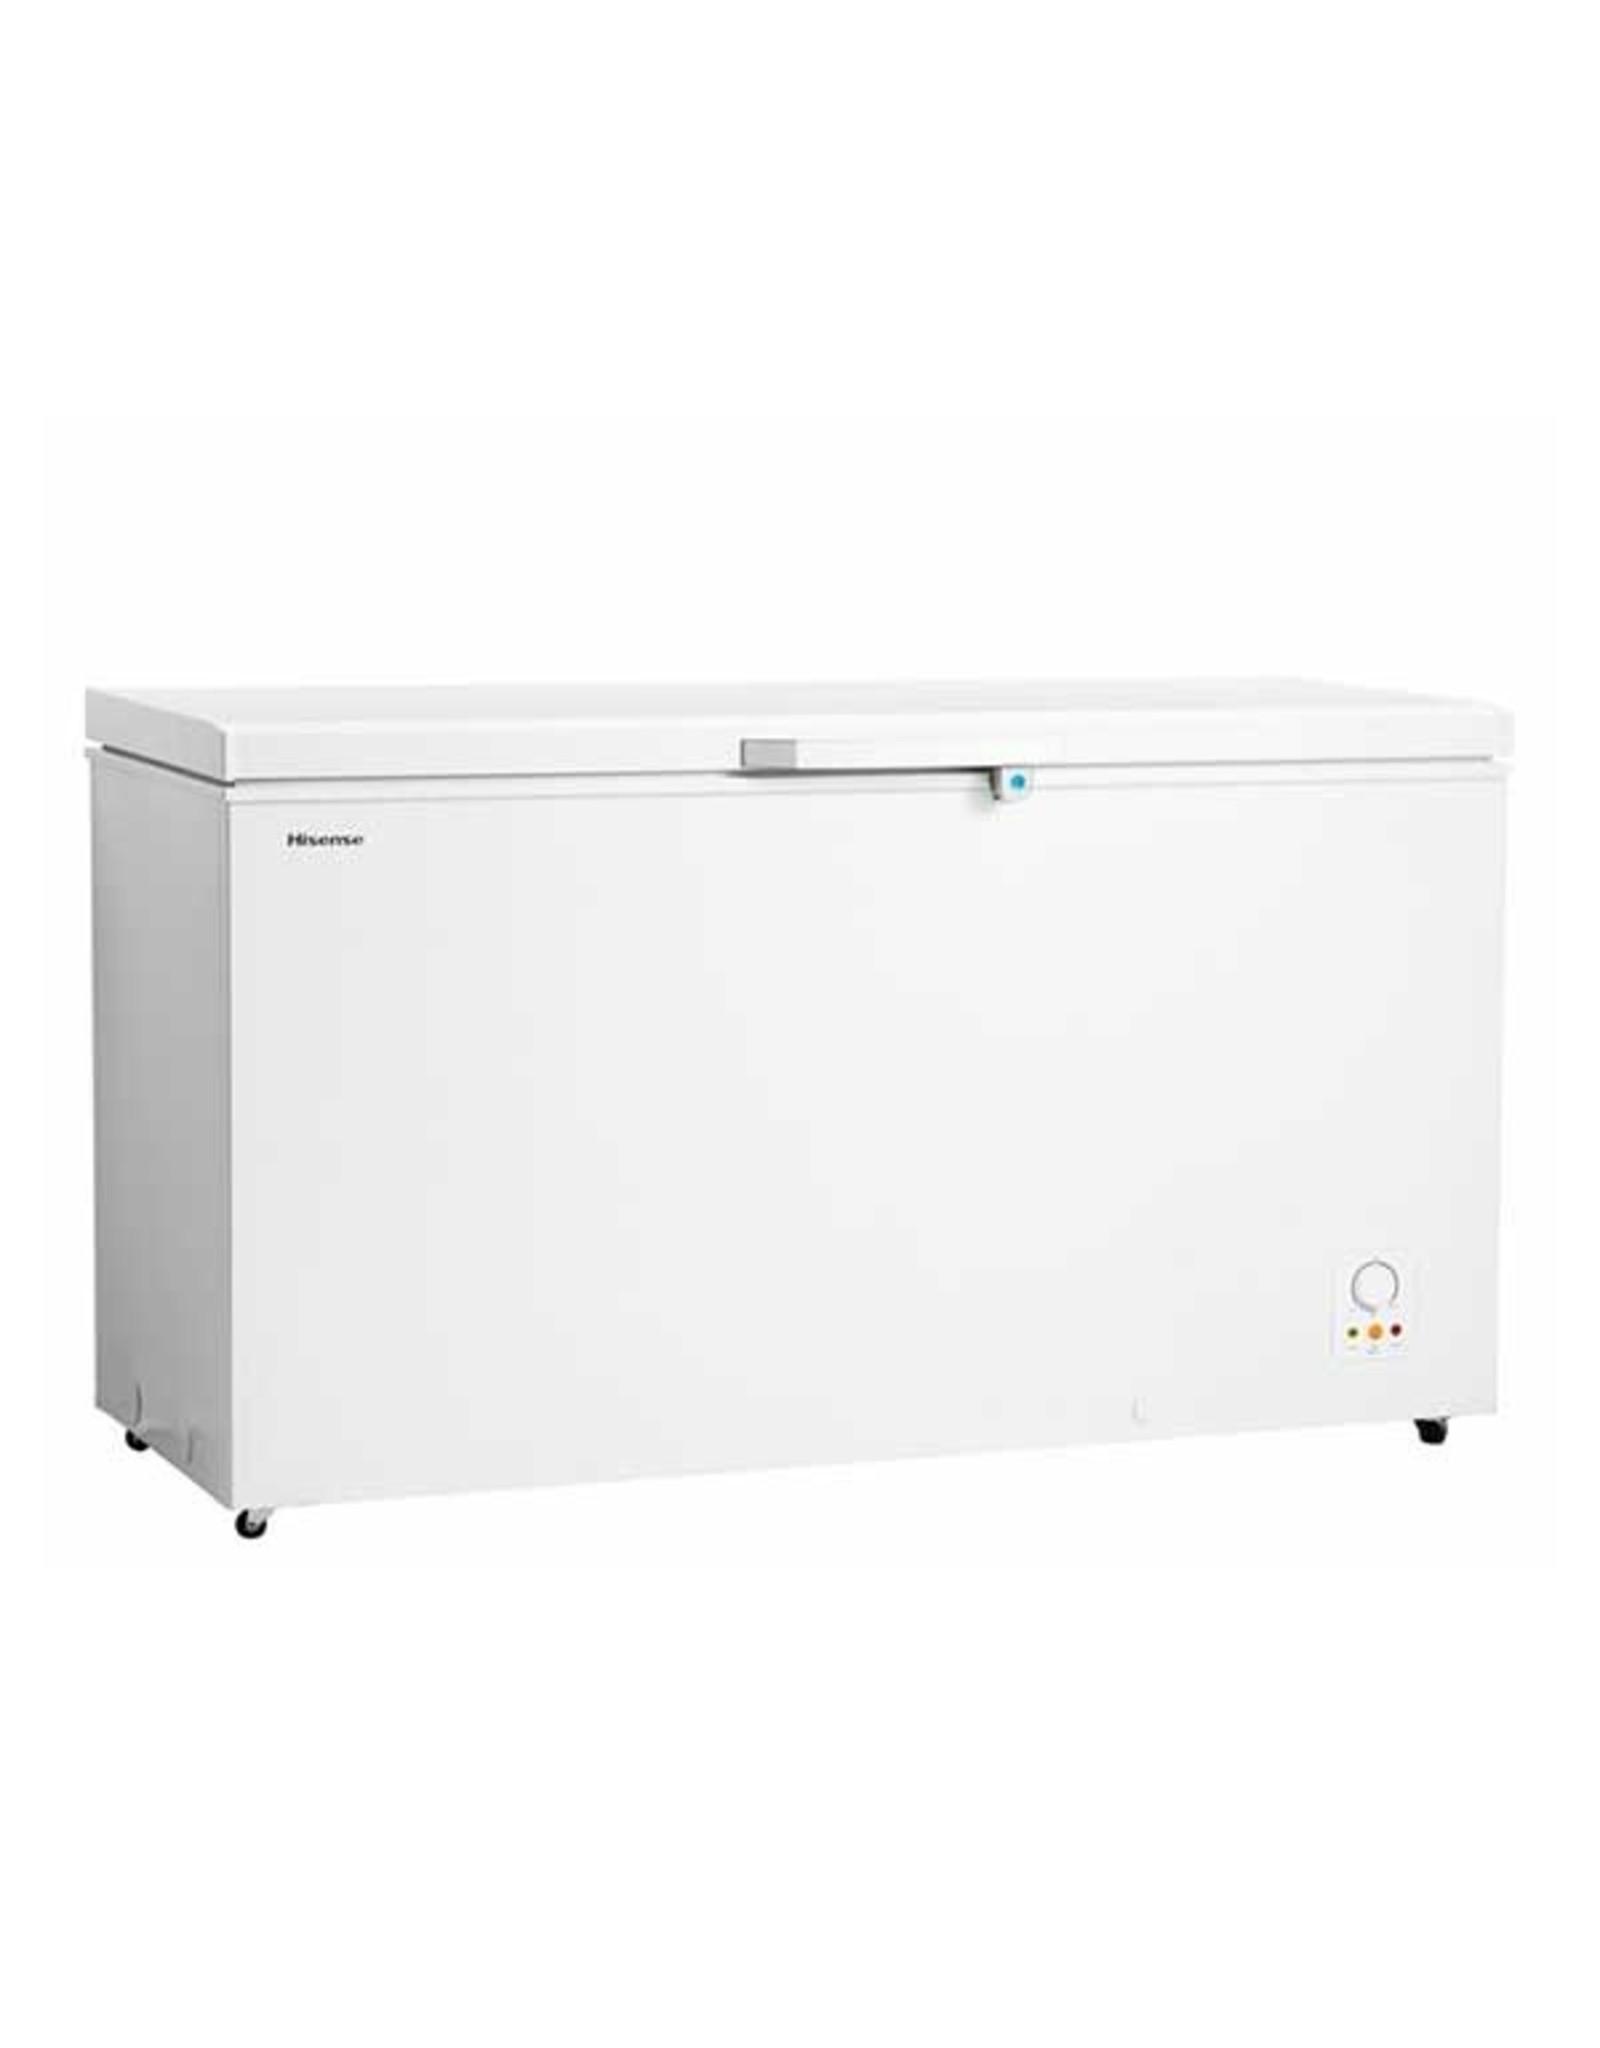 Hisense Hisense Chest Freezer 9cu ft FC88D6BWD